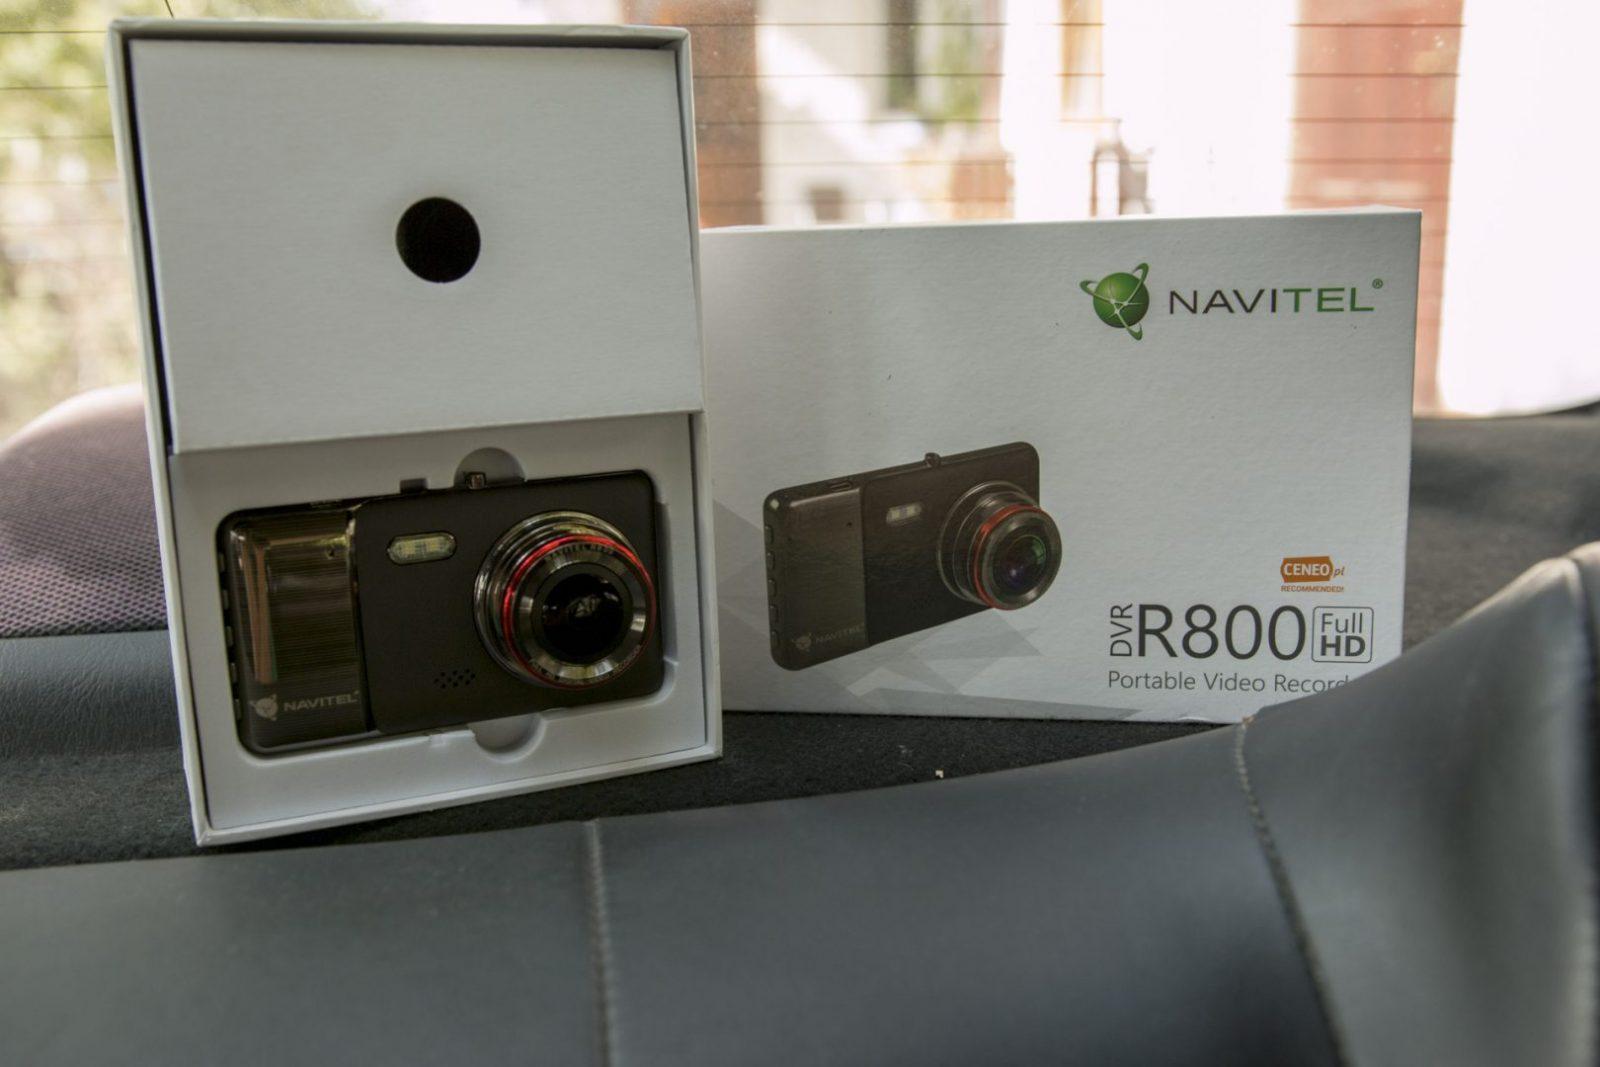 Navitel R800